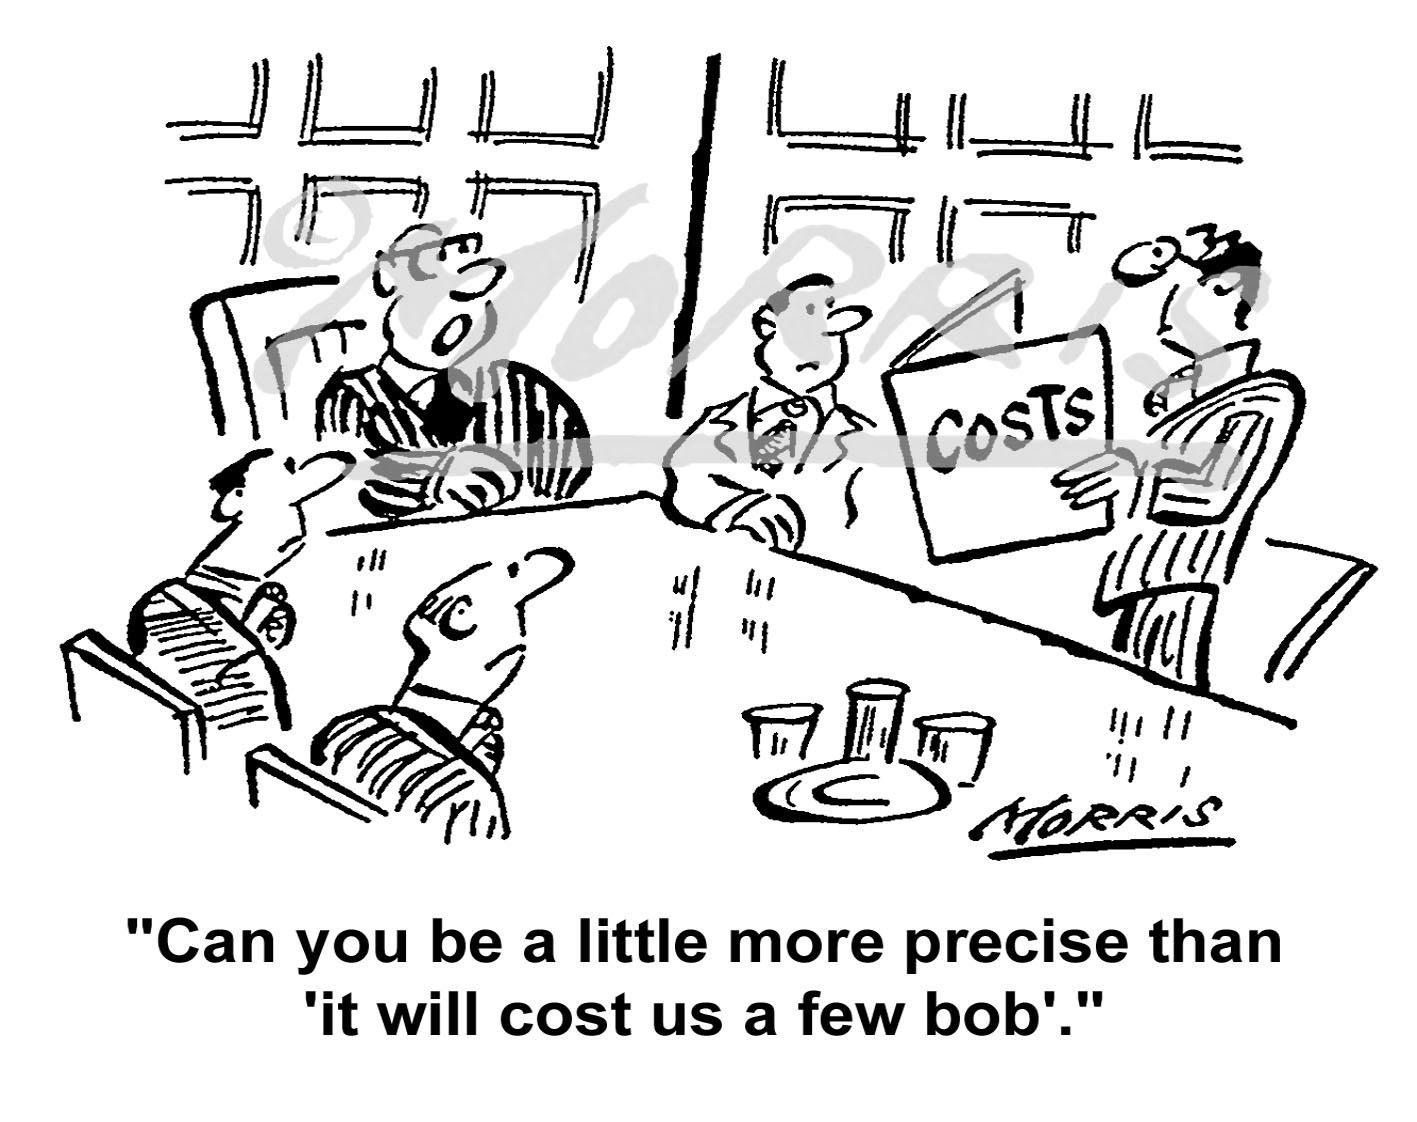 Boardroom director costs – Ref: 5063bw